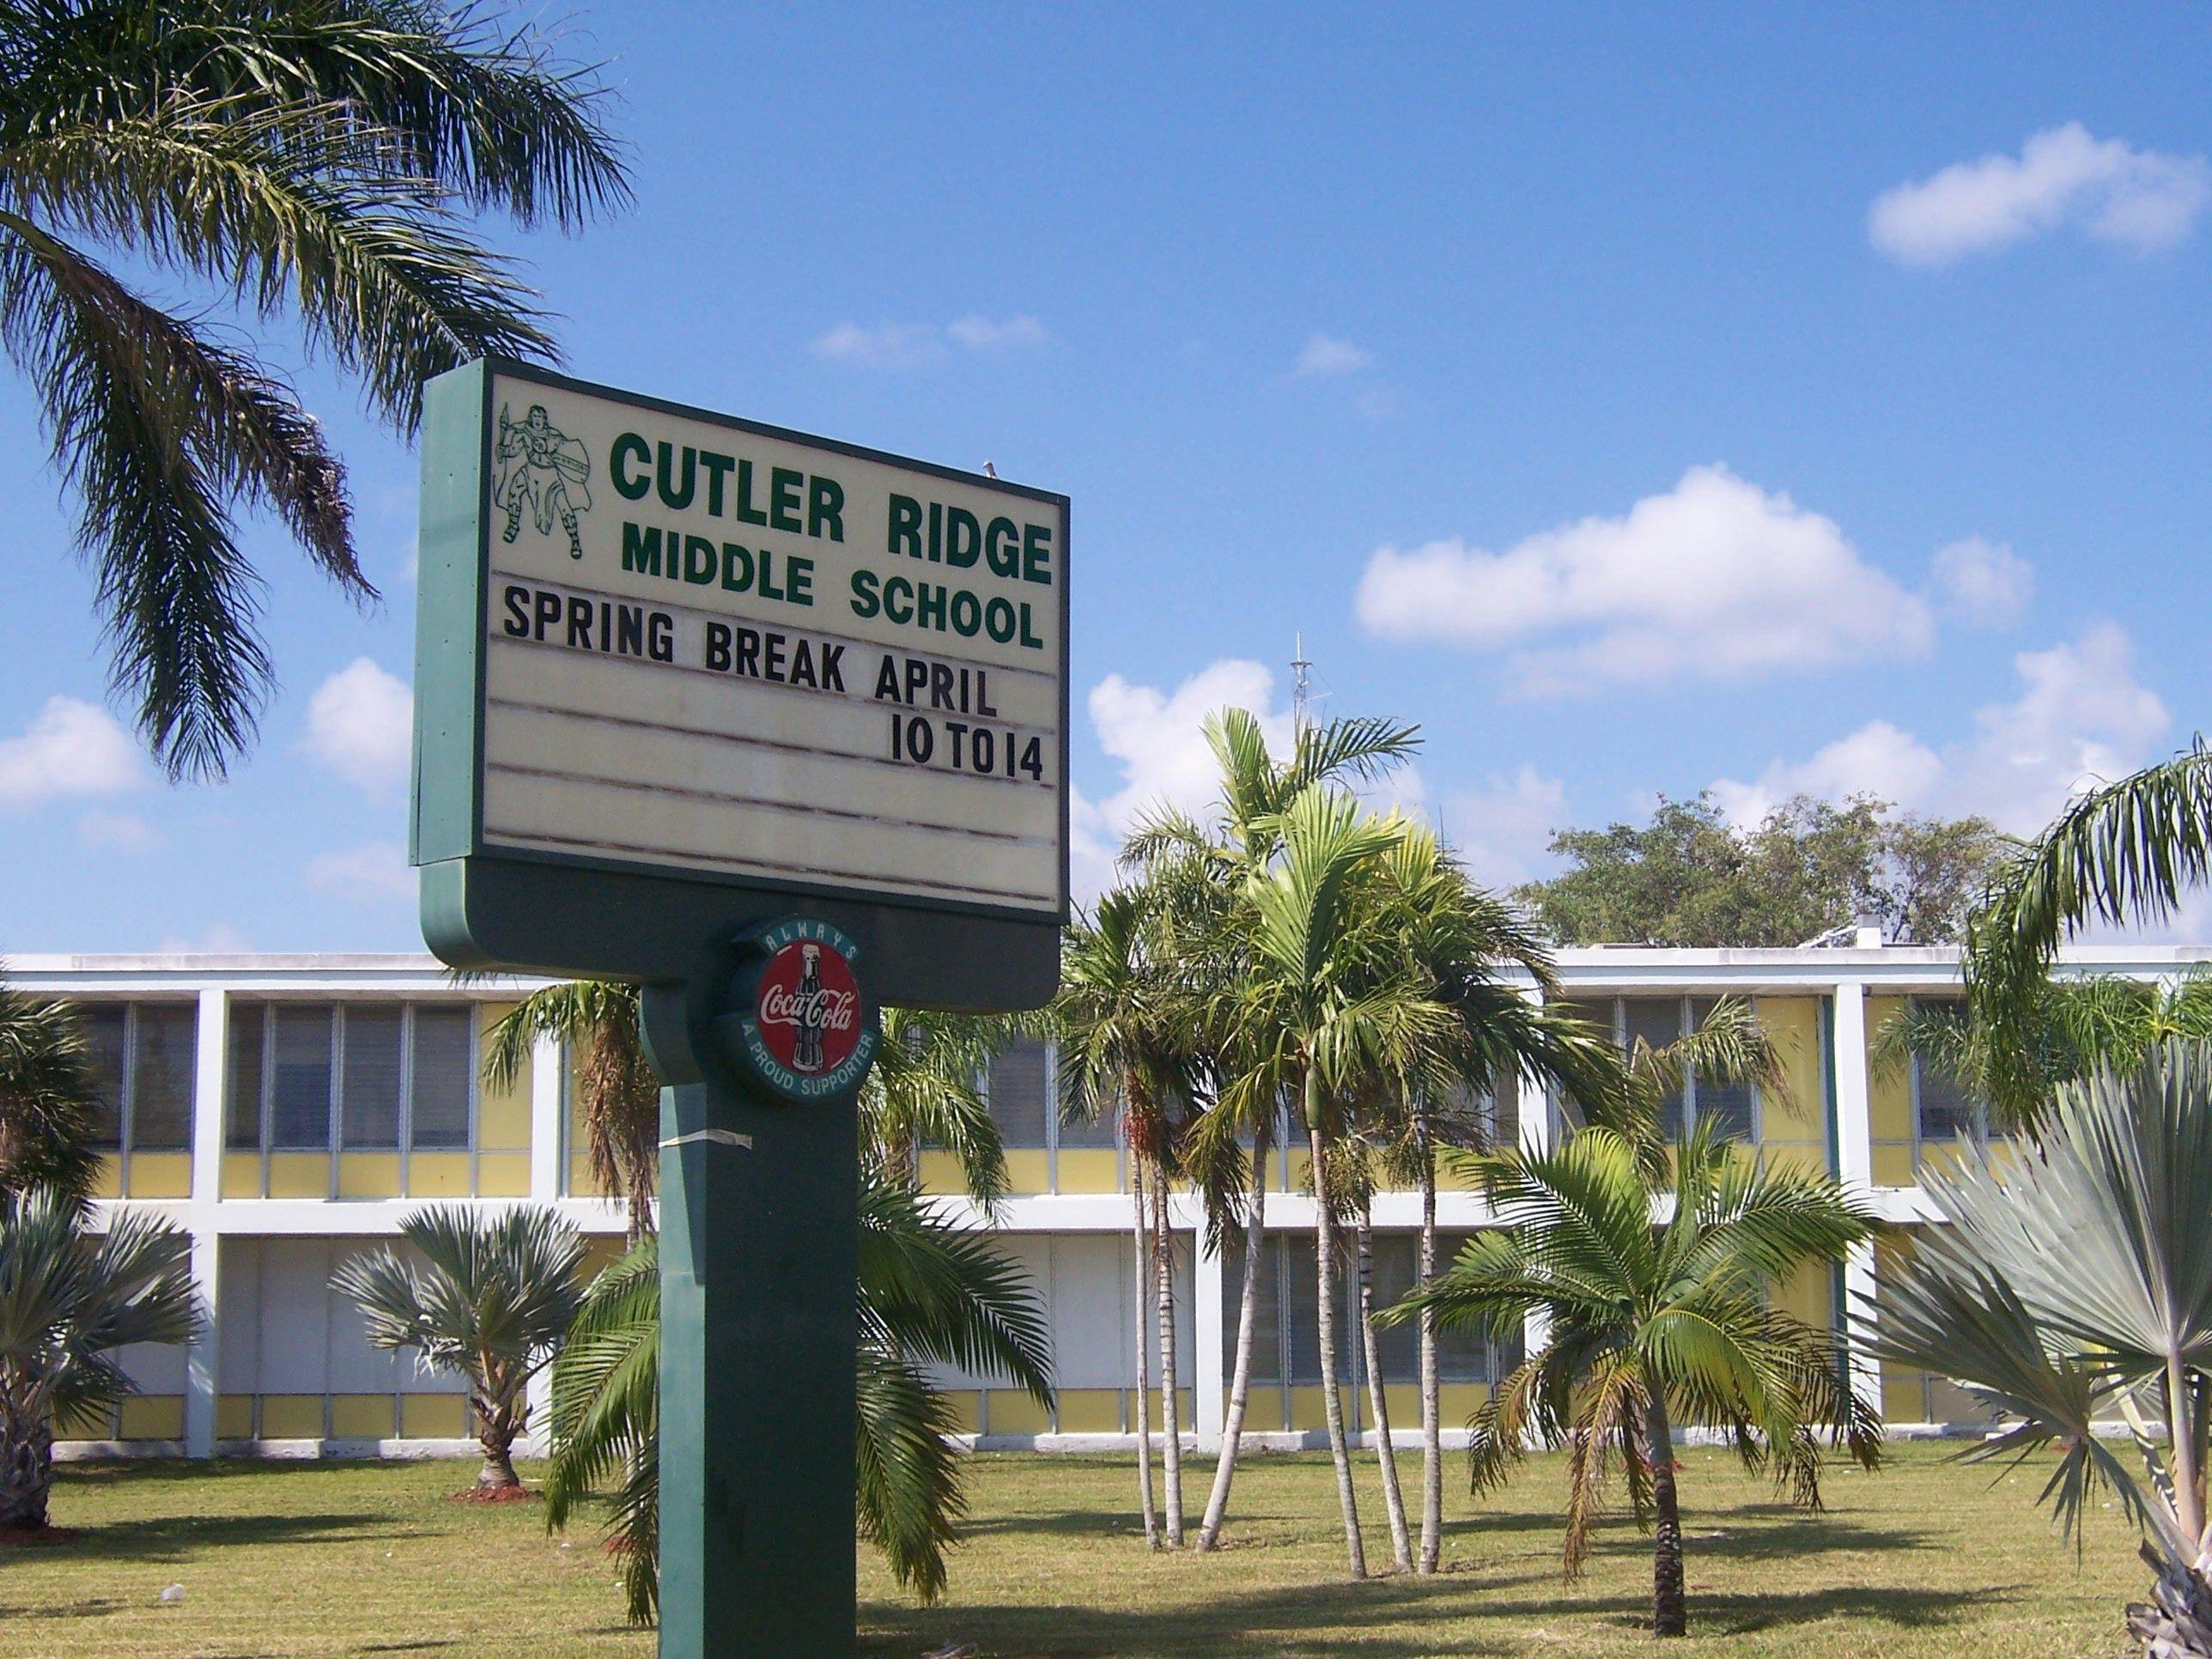 f1aa1bdfc6e51f5b84c481b414cec814 - Middle Schools In Palm Beach Gardens